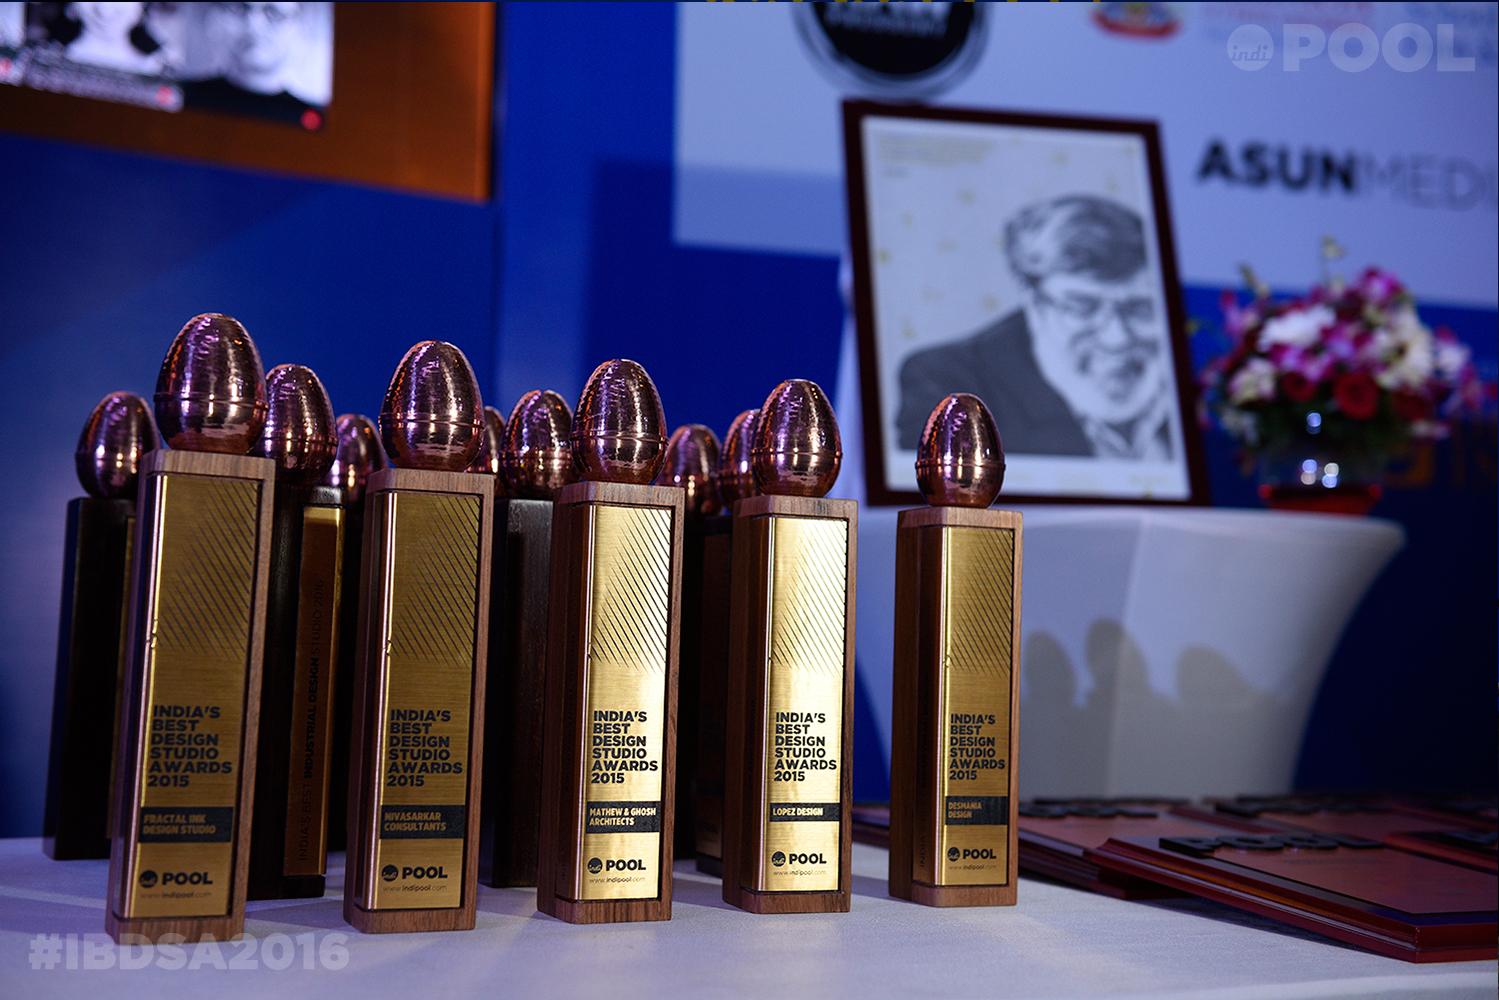 India's Best Design Studio Awards Trophies